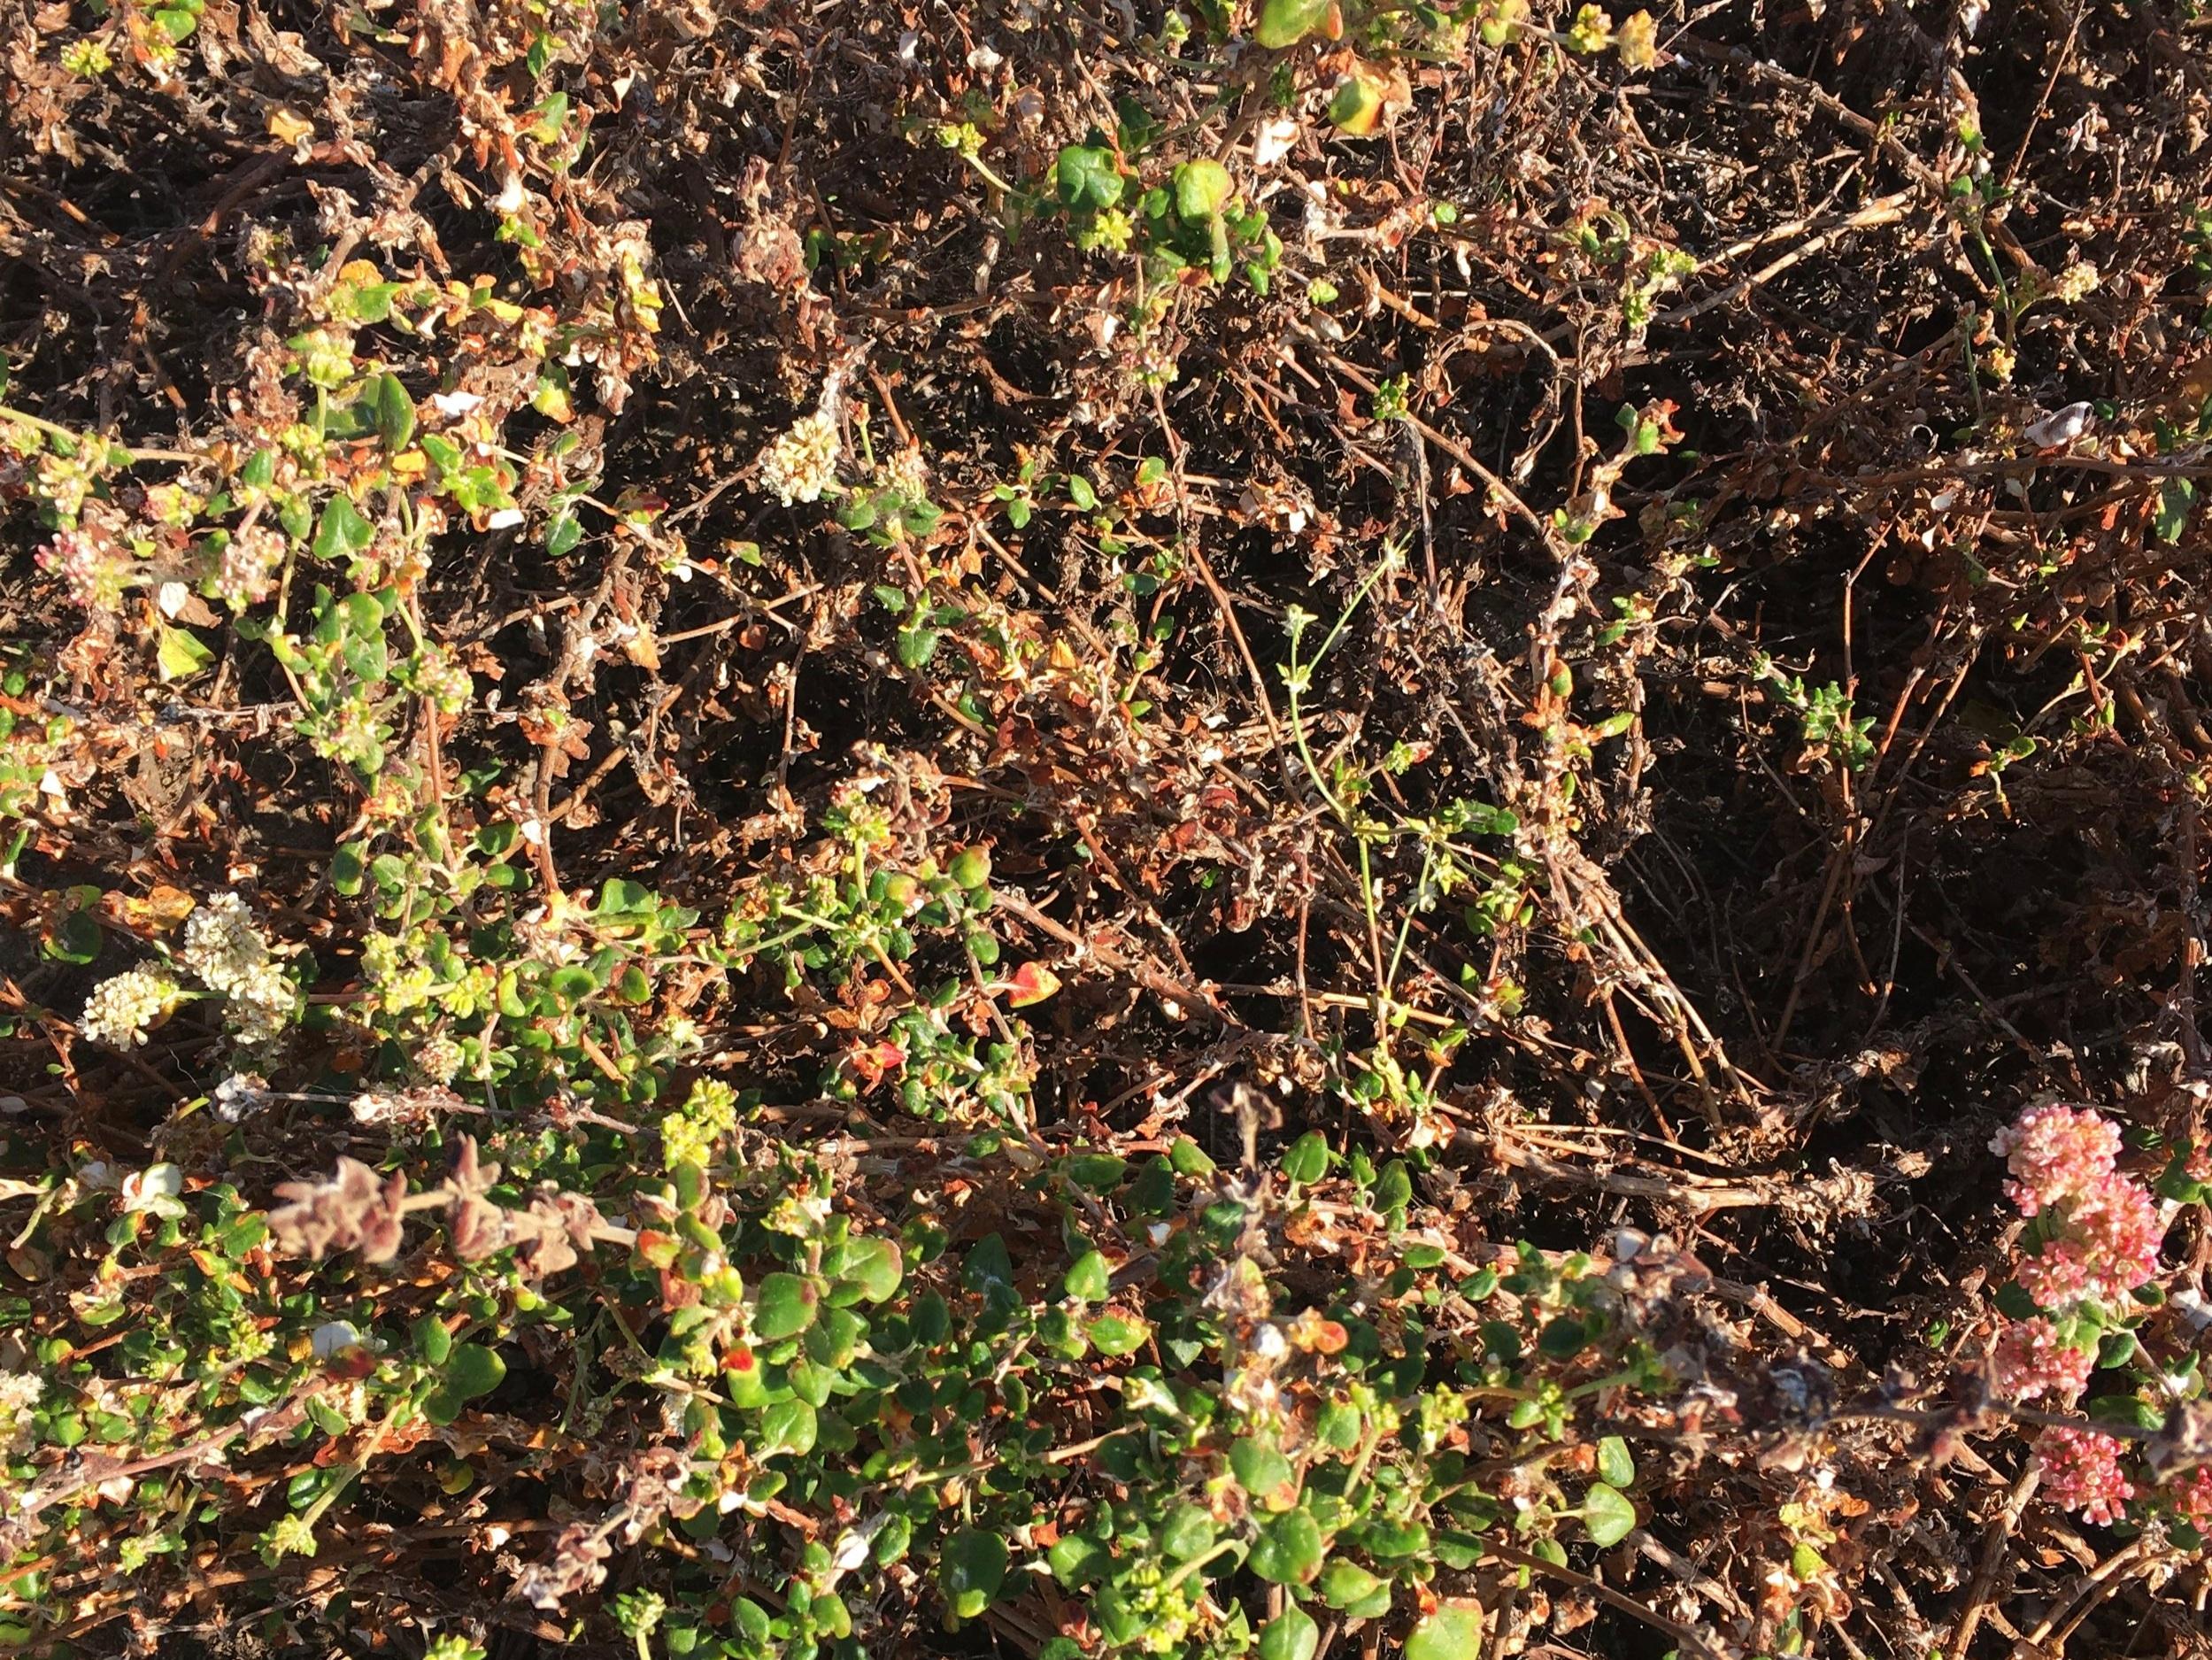 Eriogonum fasciculatum, California buckwheat in partial summer dormancy. Sunset Cliffs Natural Park, San Diego.